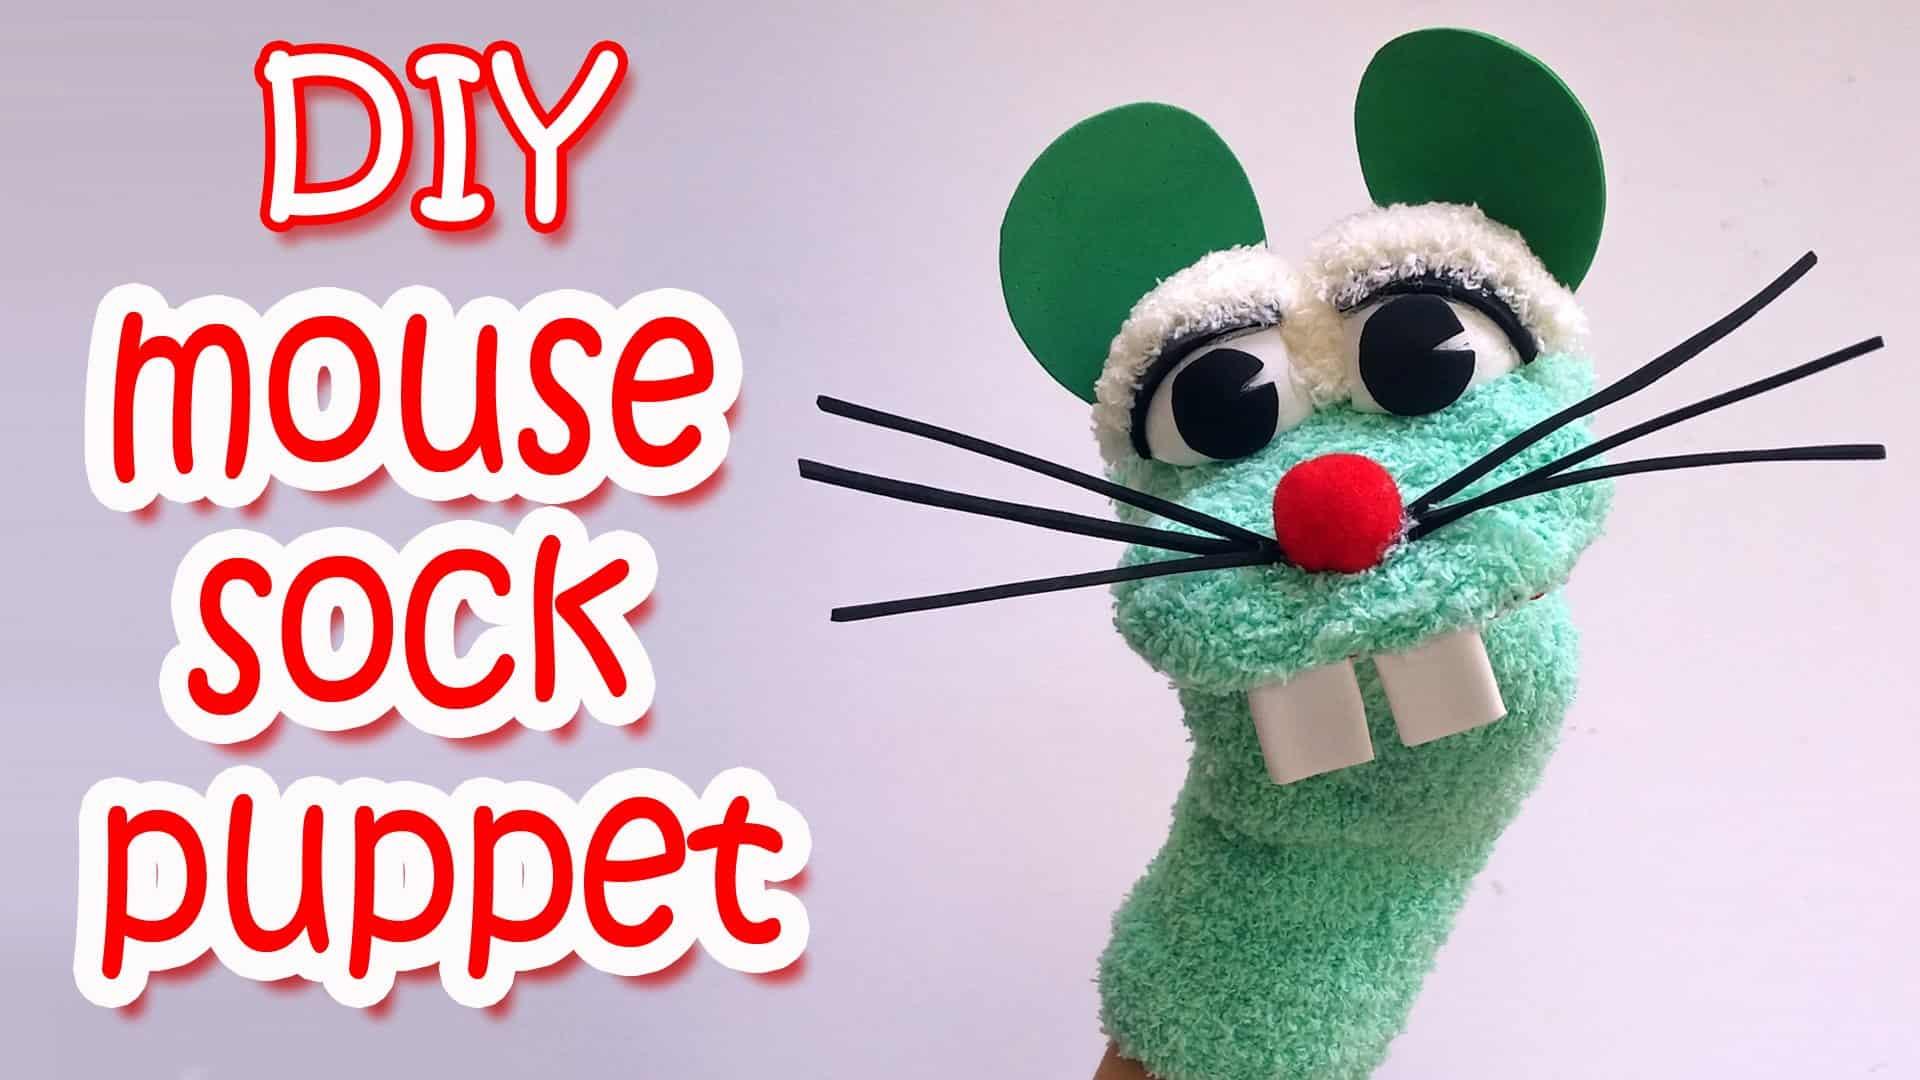 Room 10 blog 2013: making sock puppets.